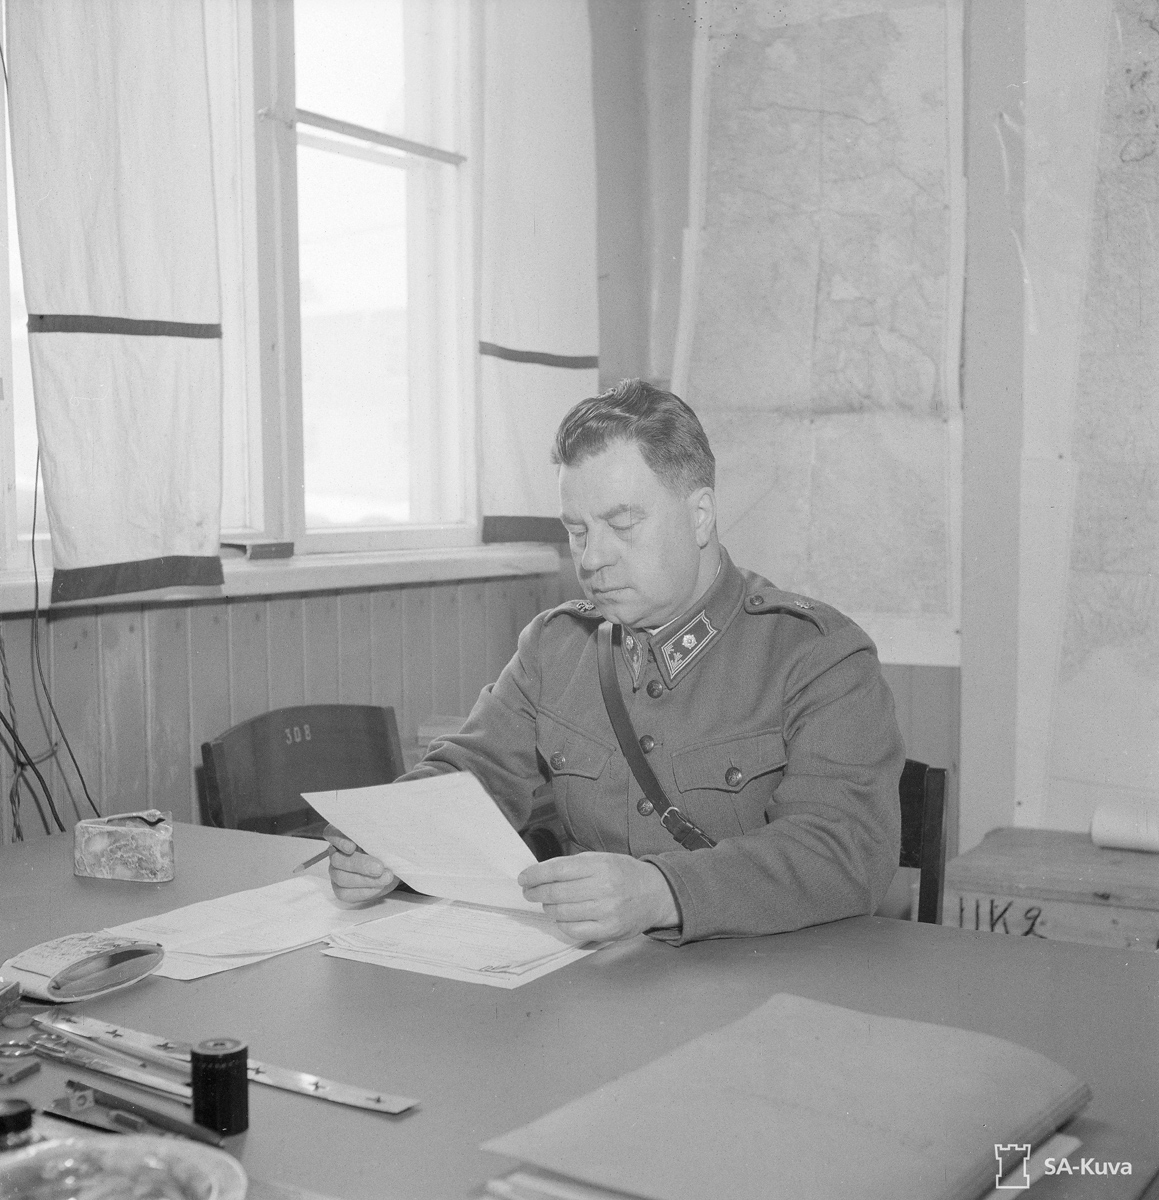 1942. Major Hannes Vehniäinen